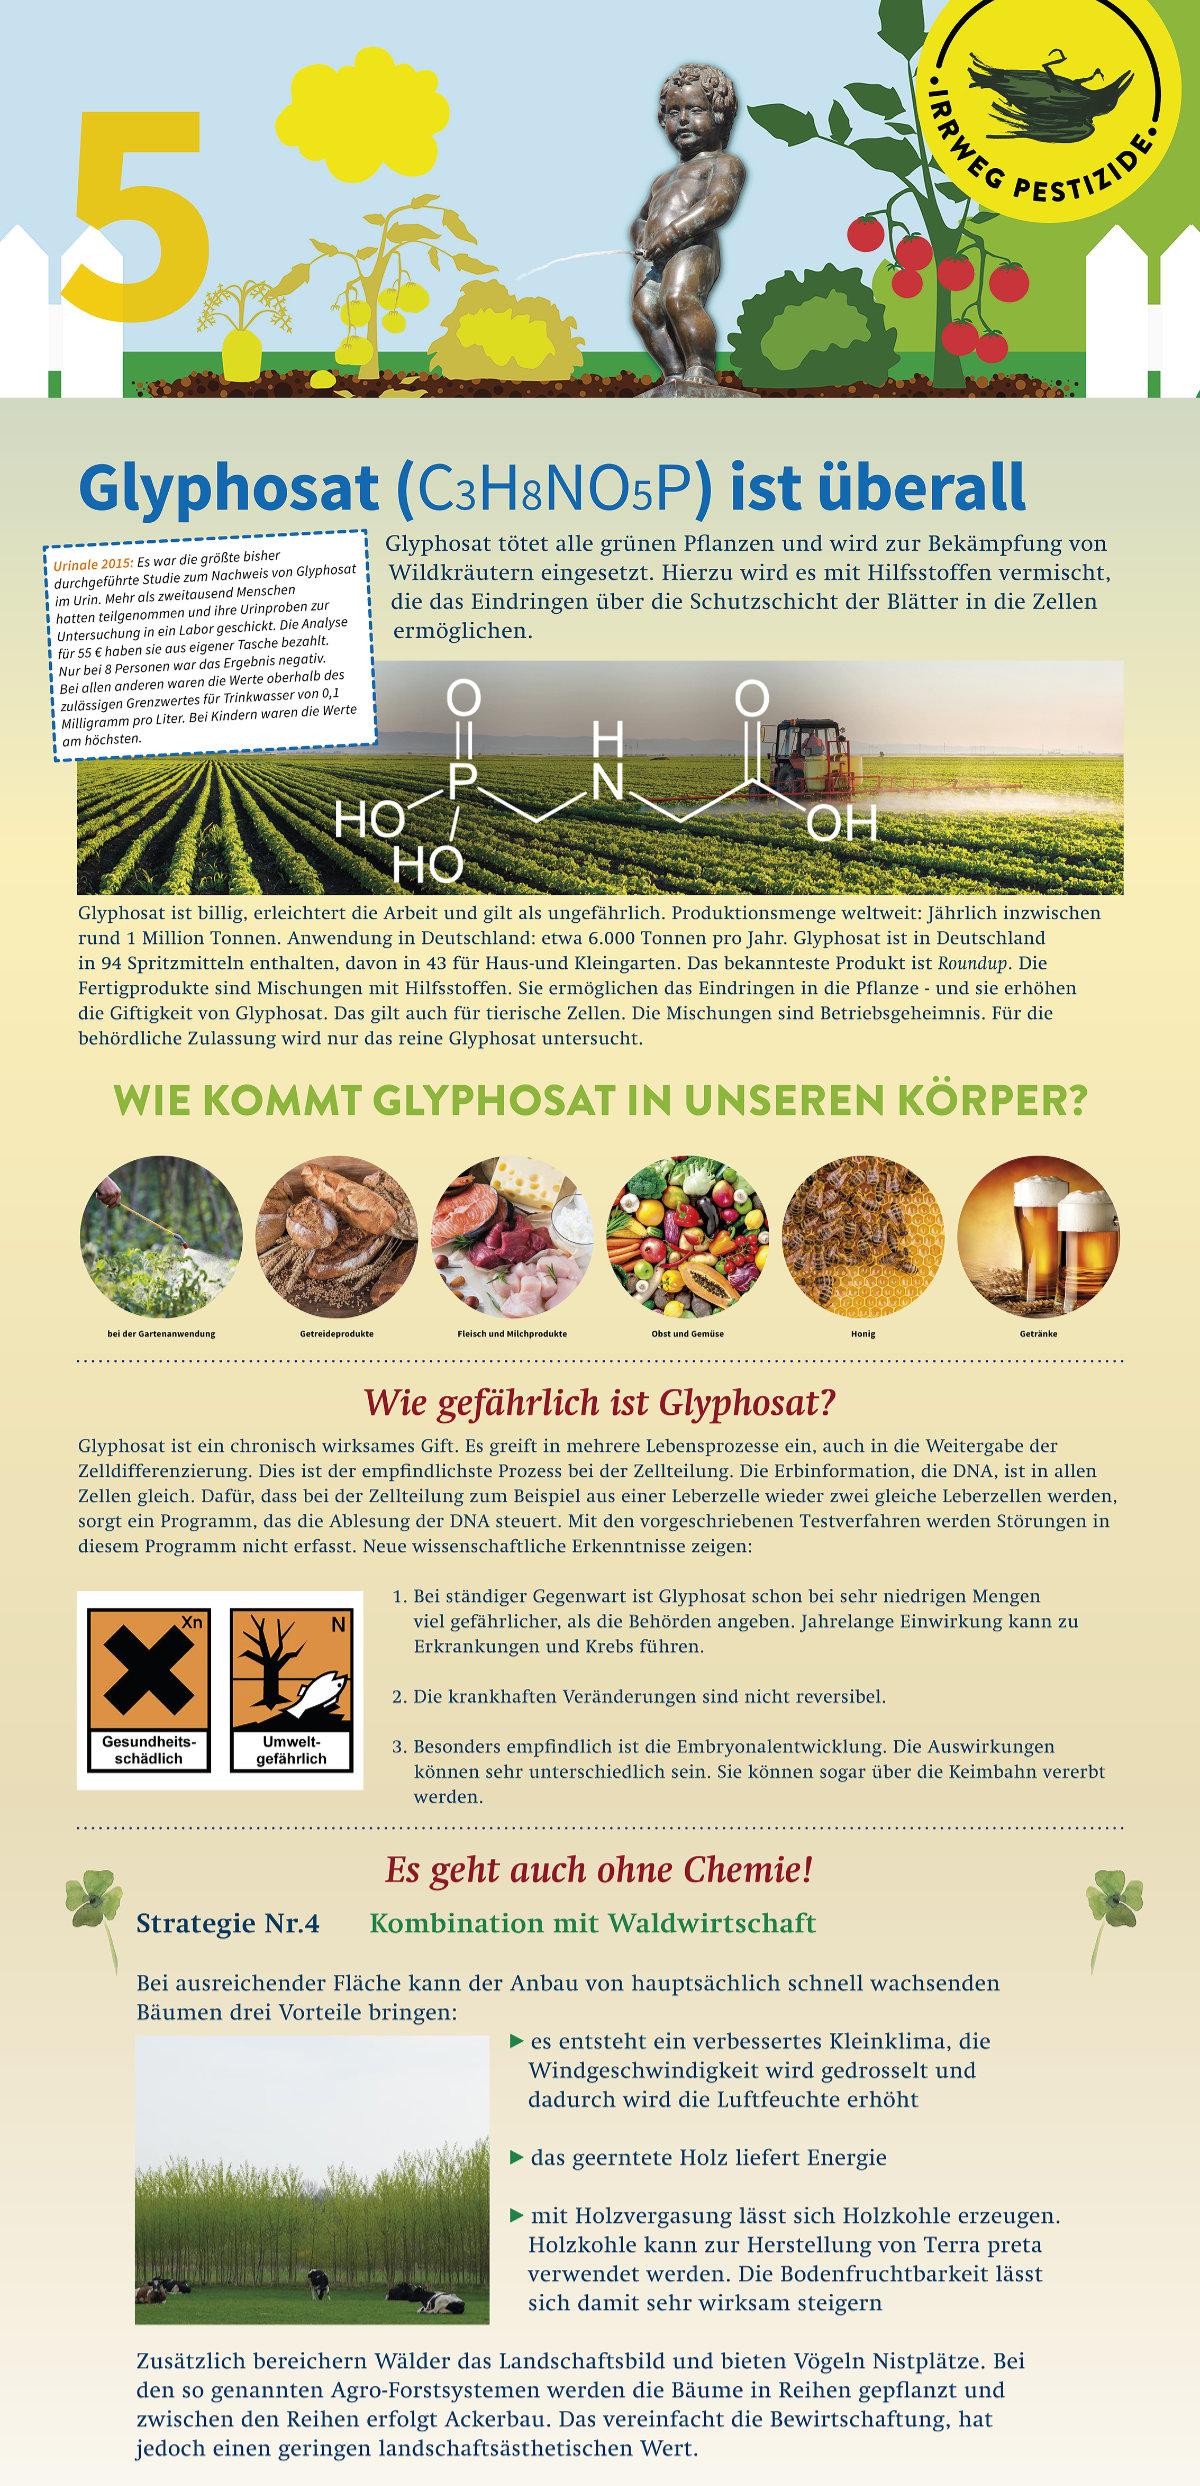 Irrweg Pestizide Überall ist Glyphosat